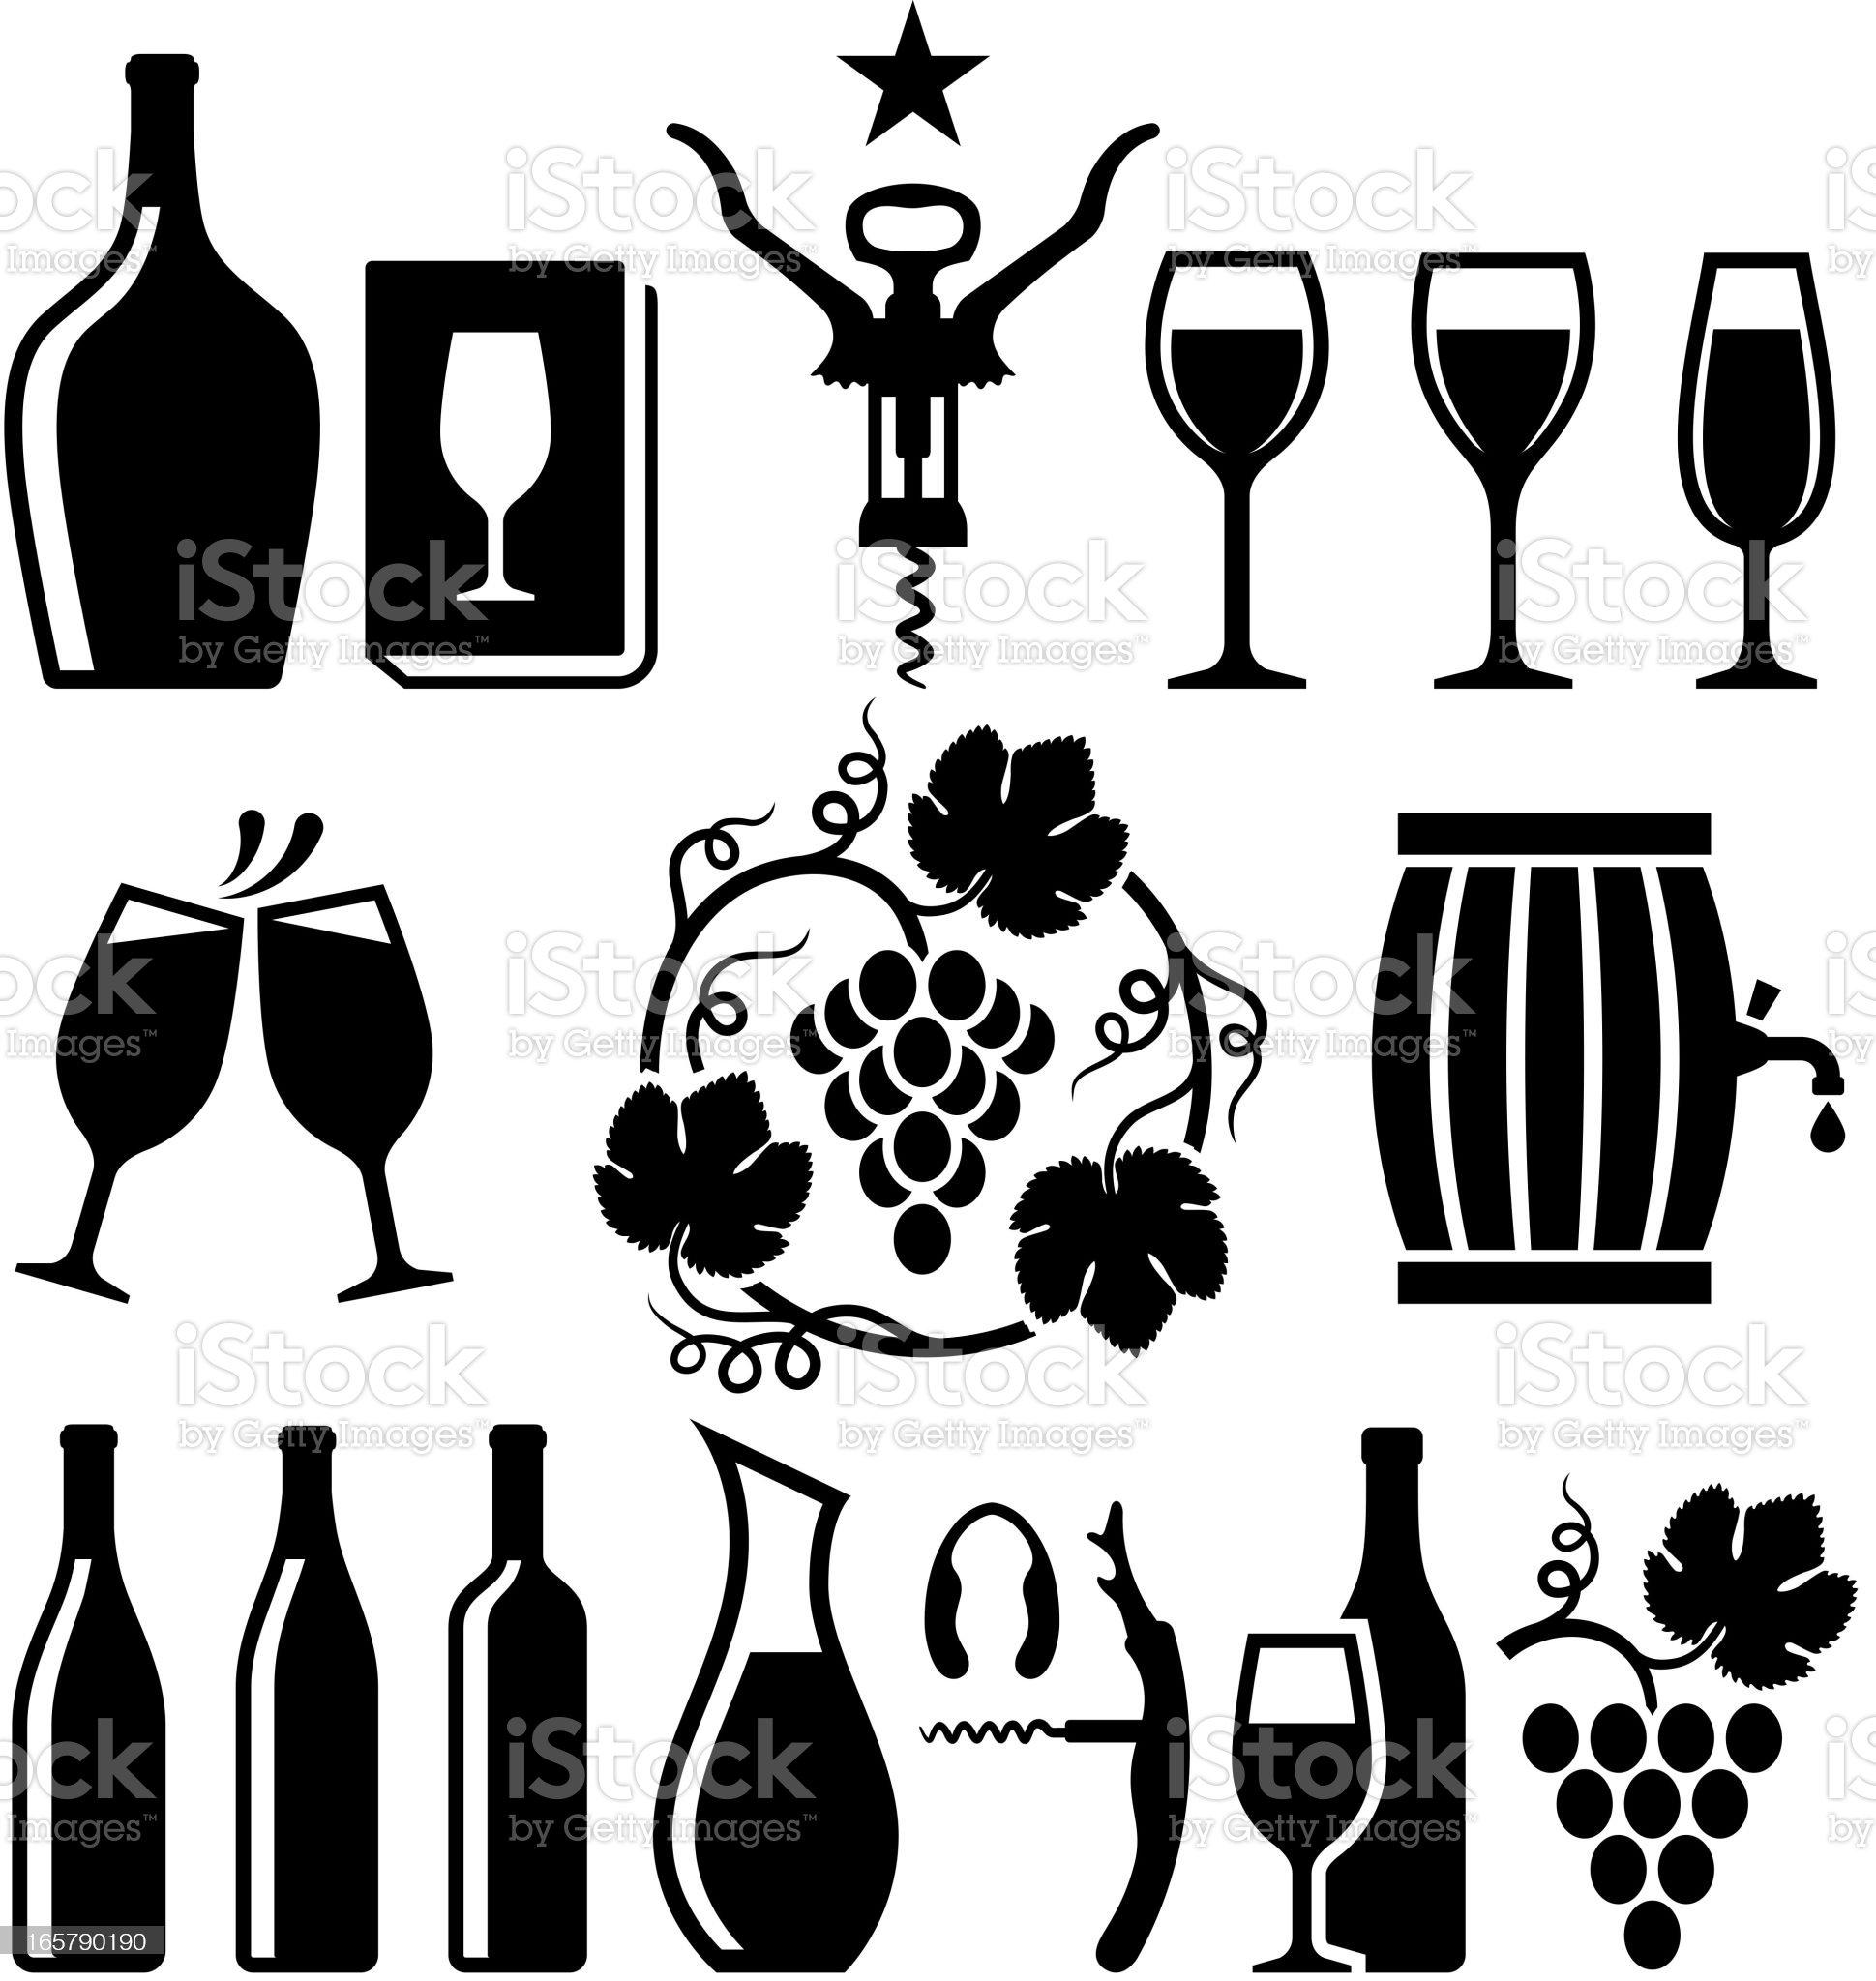 Wine black & white royalty free vector icon set royalty-free stock vector art